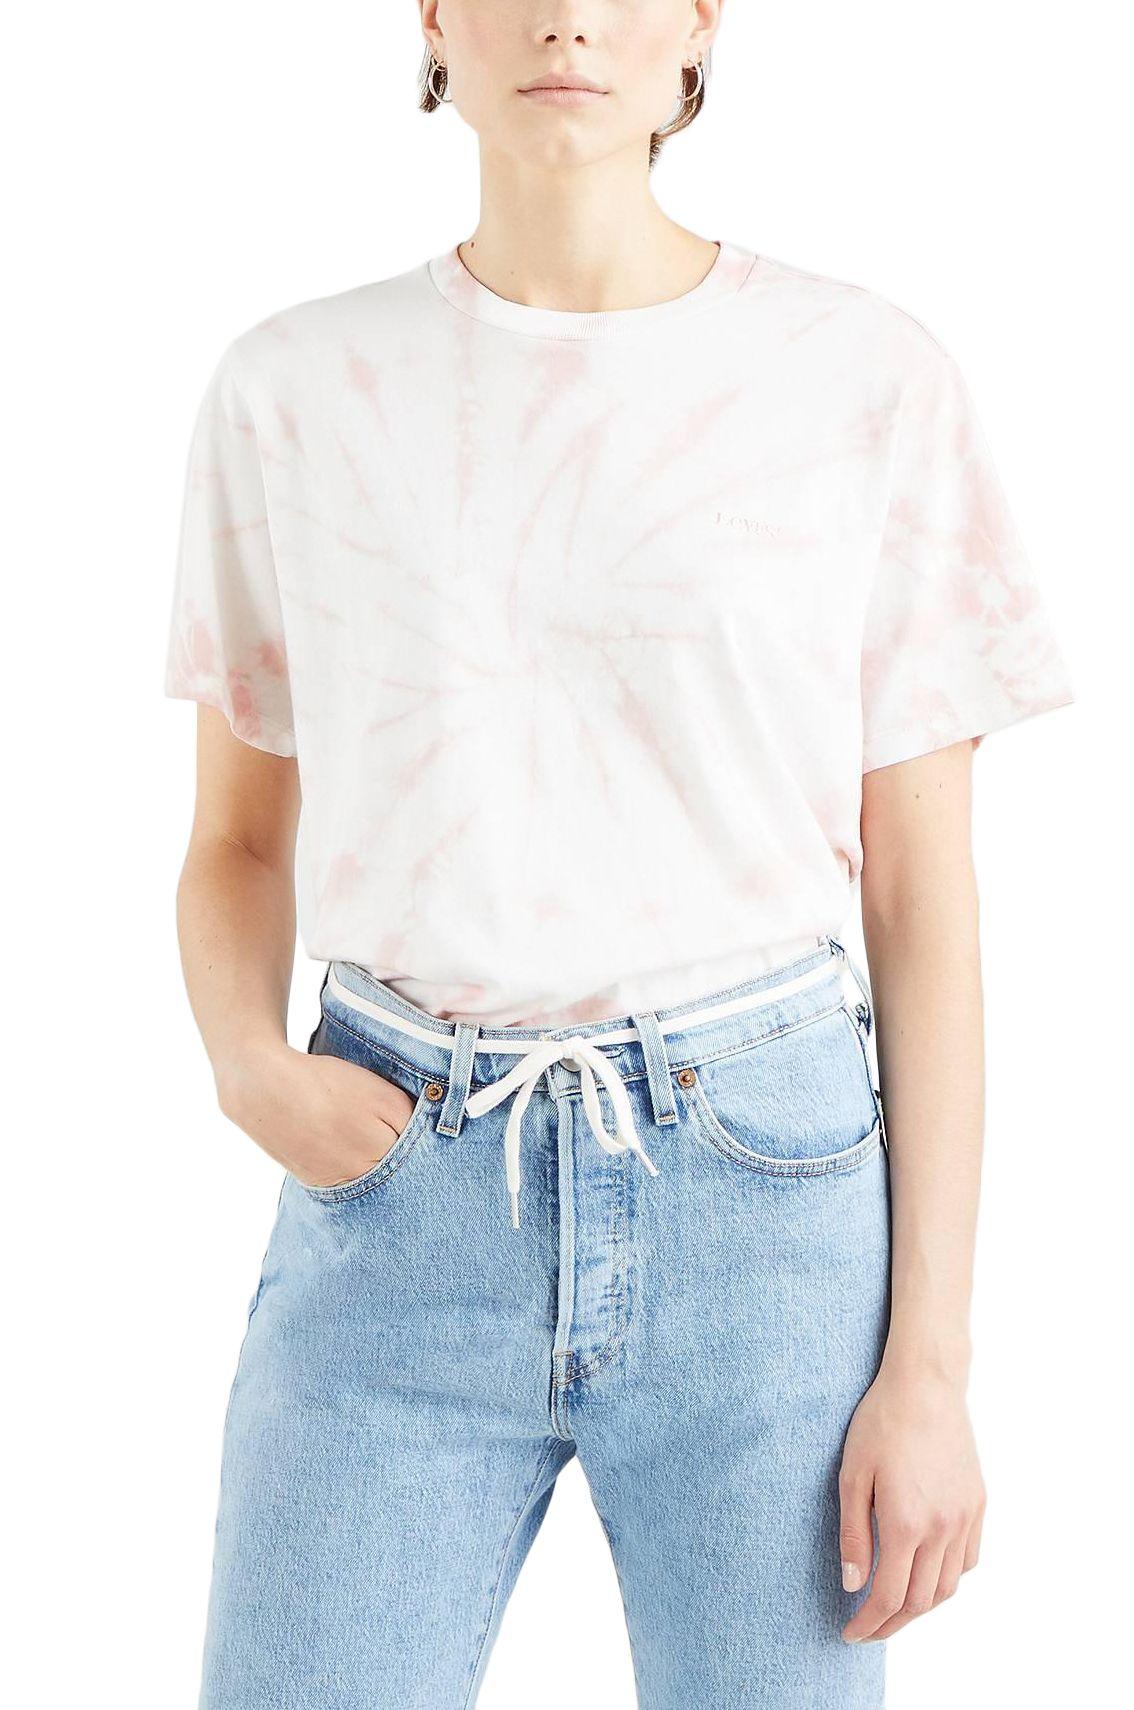 Levis T-Shirt GRAPHIC JET TEE Iris Tie Dye Dark Fa166136 Evening Sand